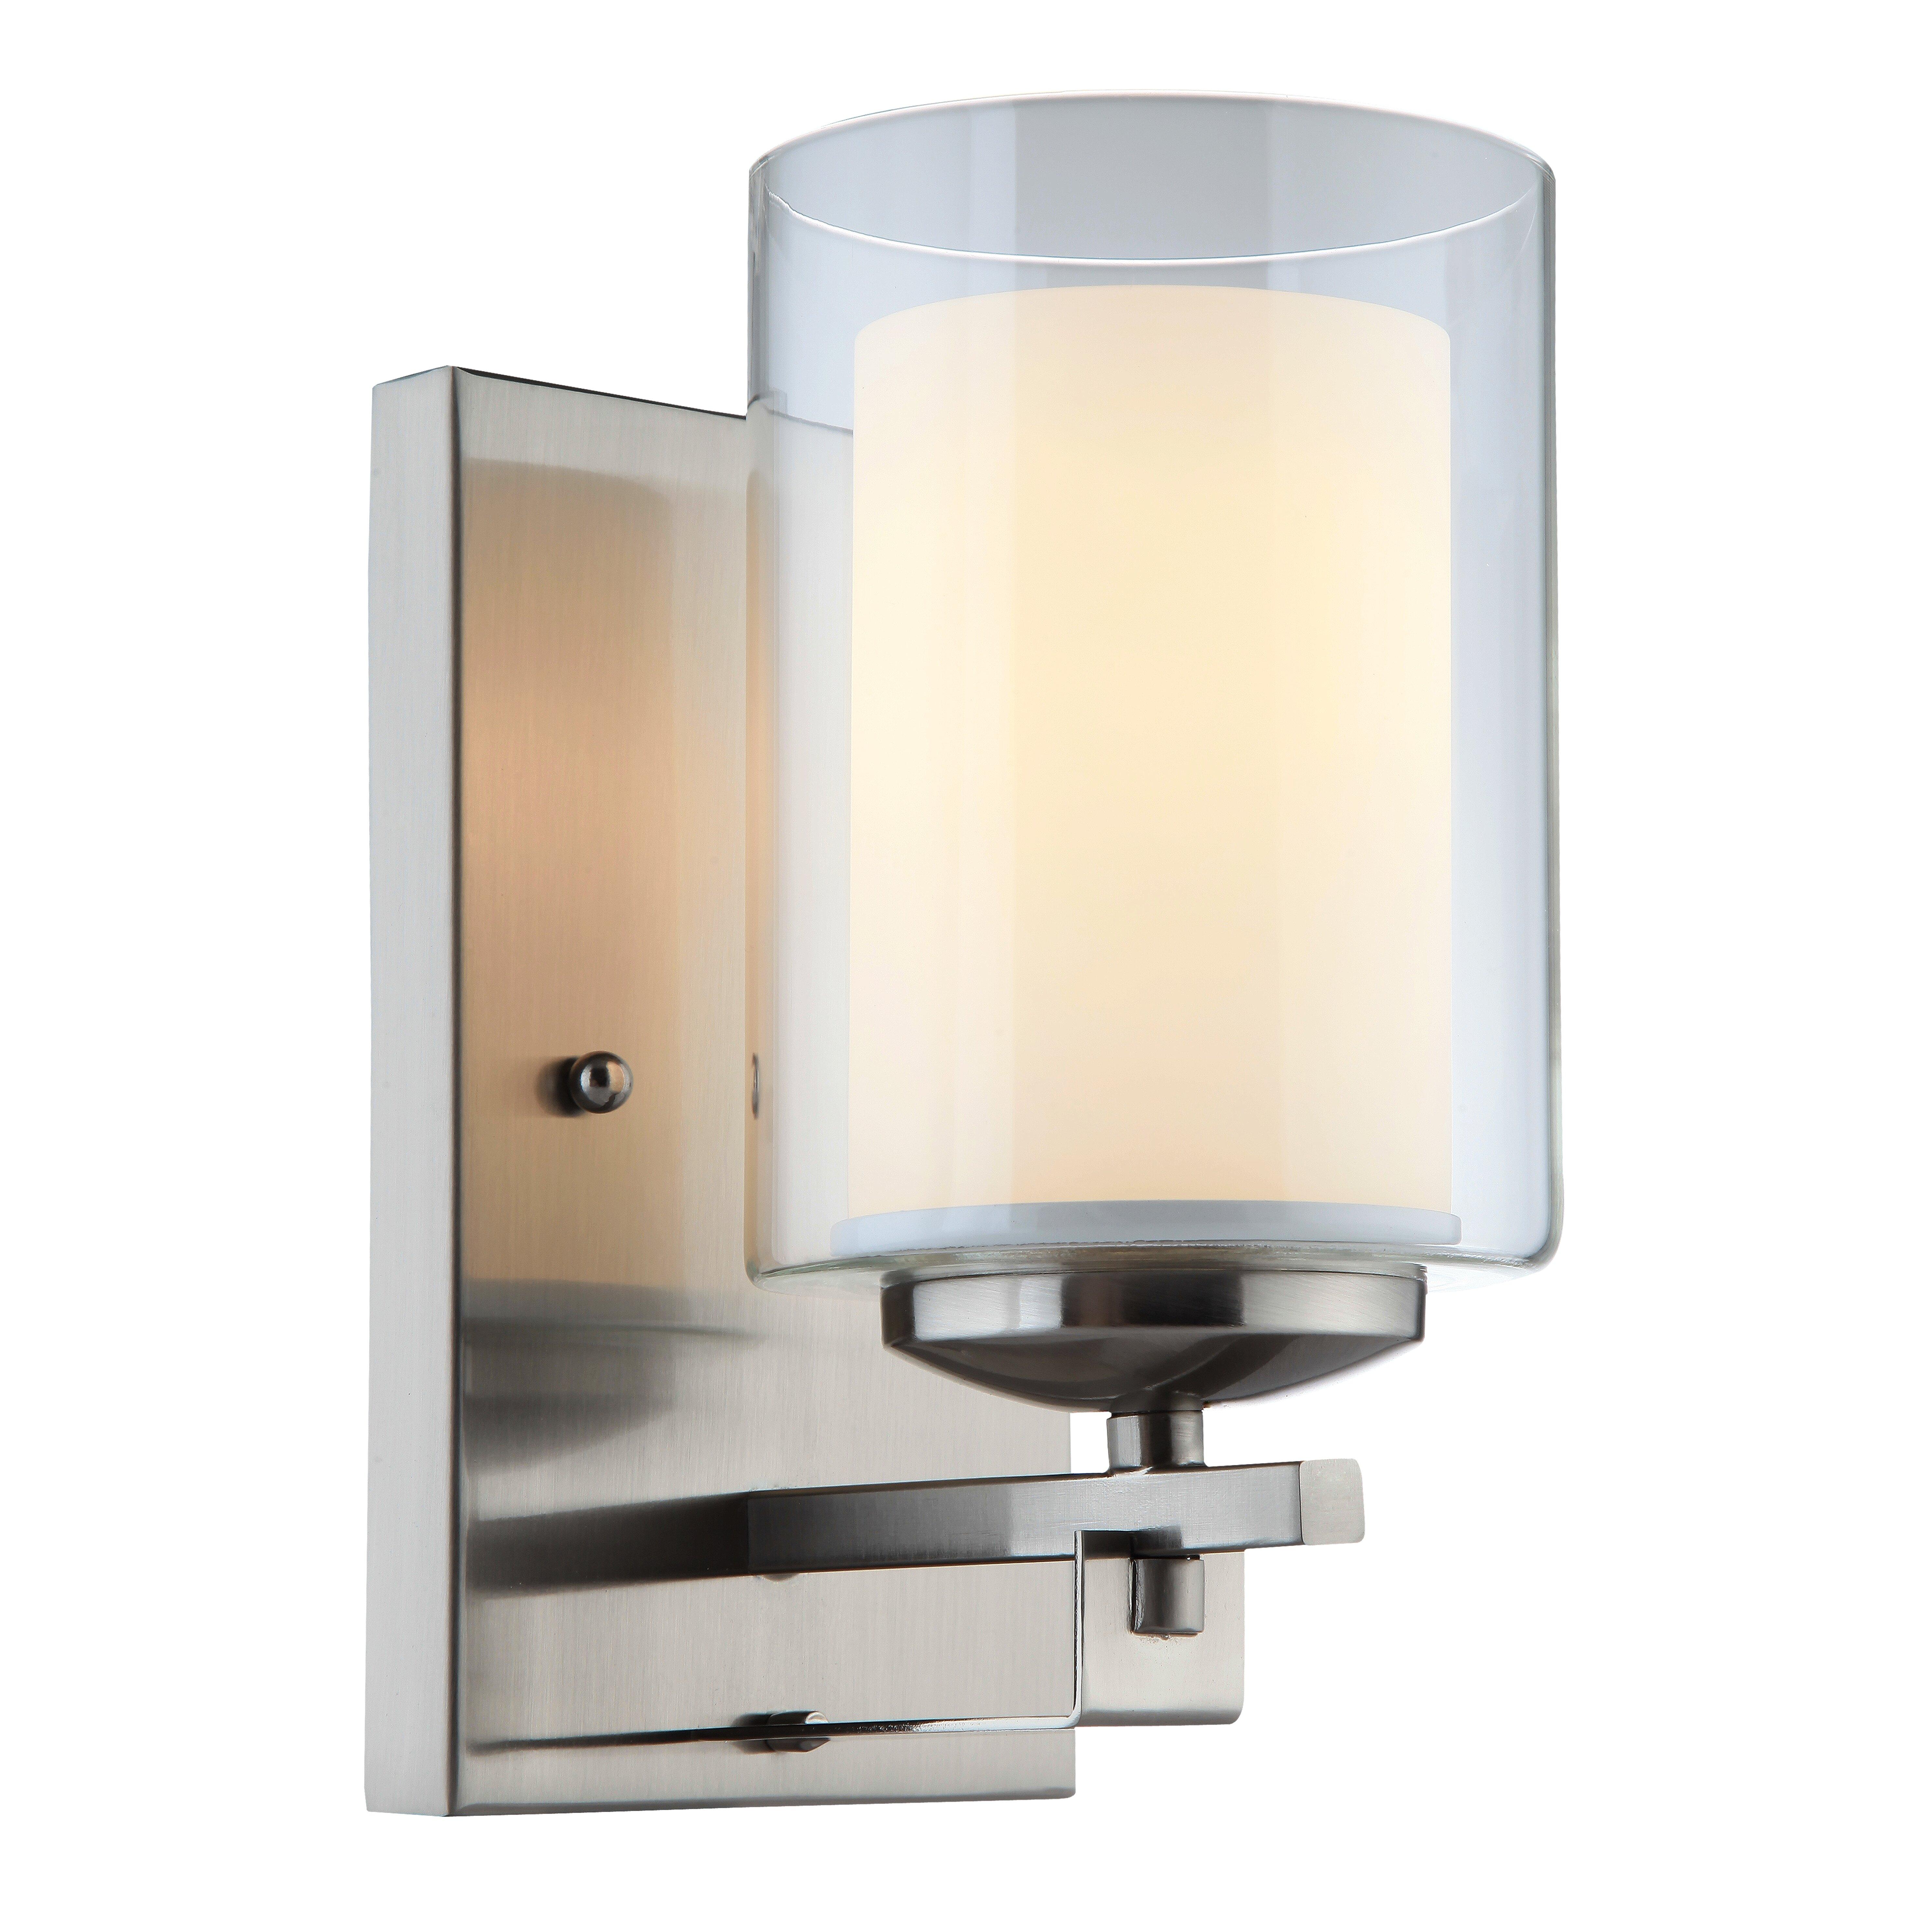 Hardware House El Dorado 1-Light Wall Sconce & Reviews Wayfair